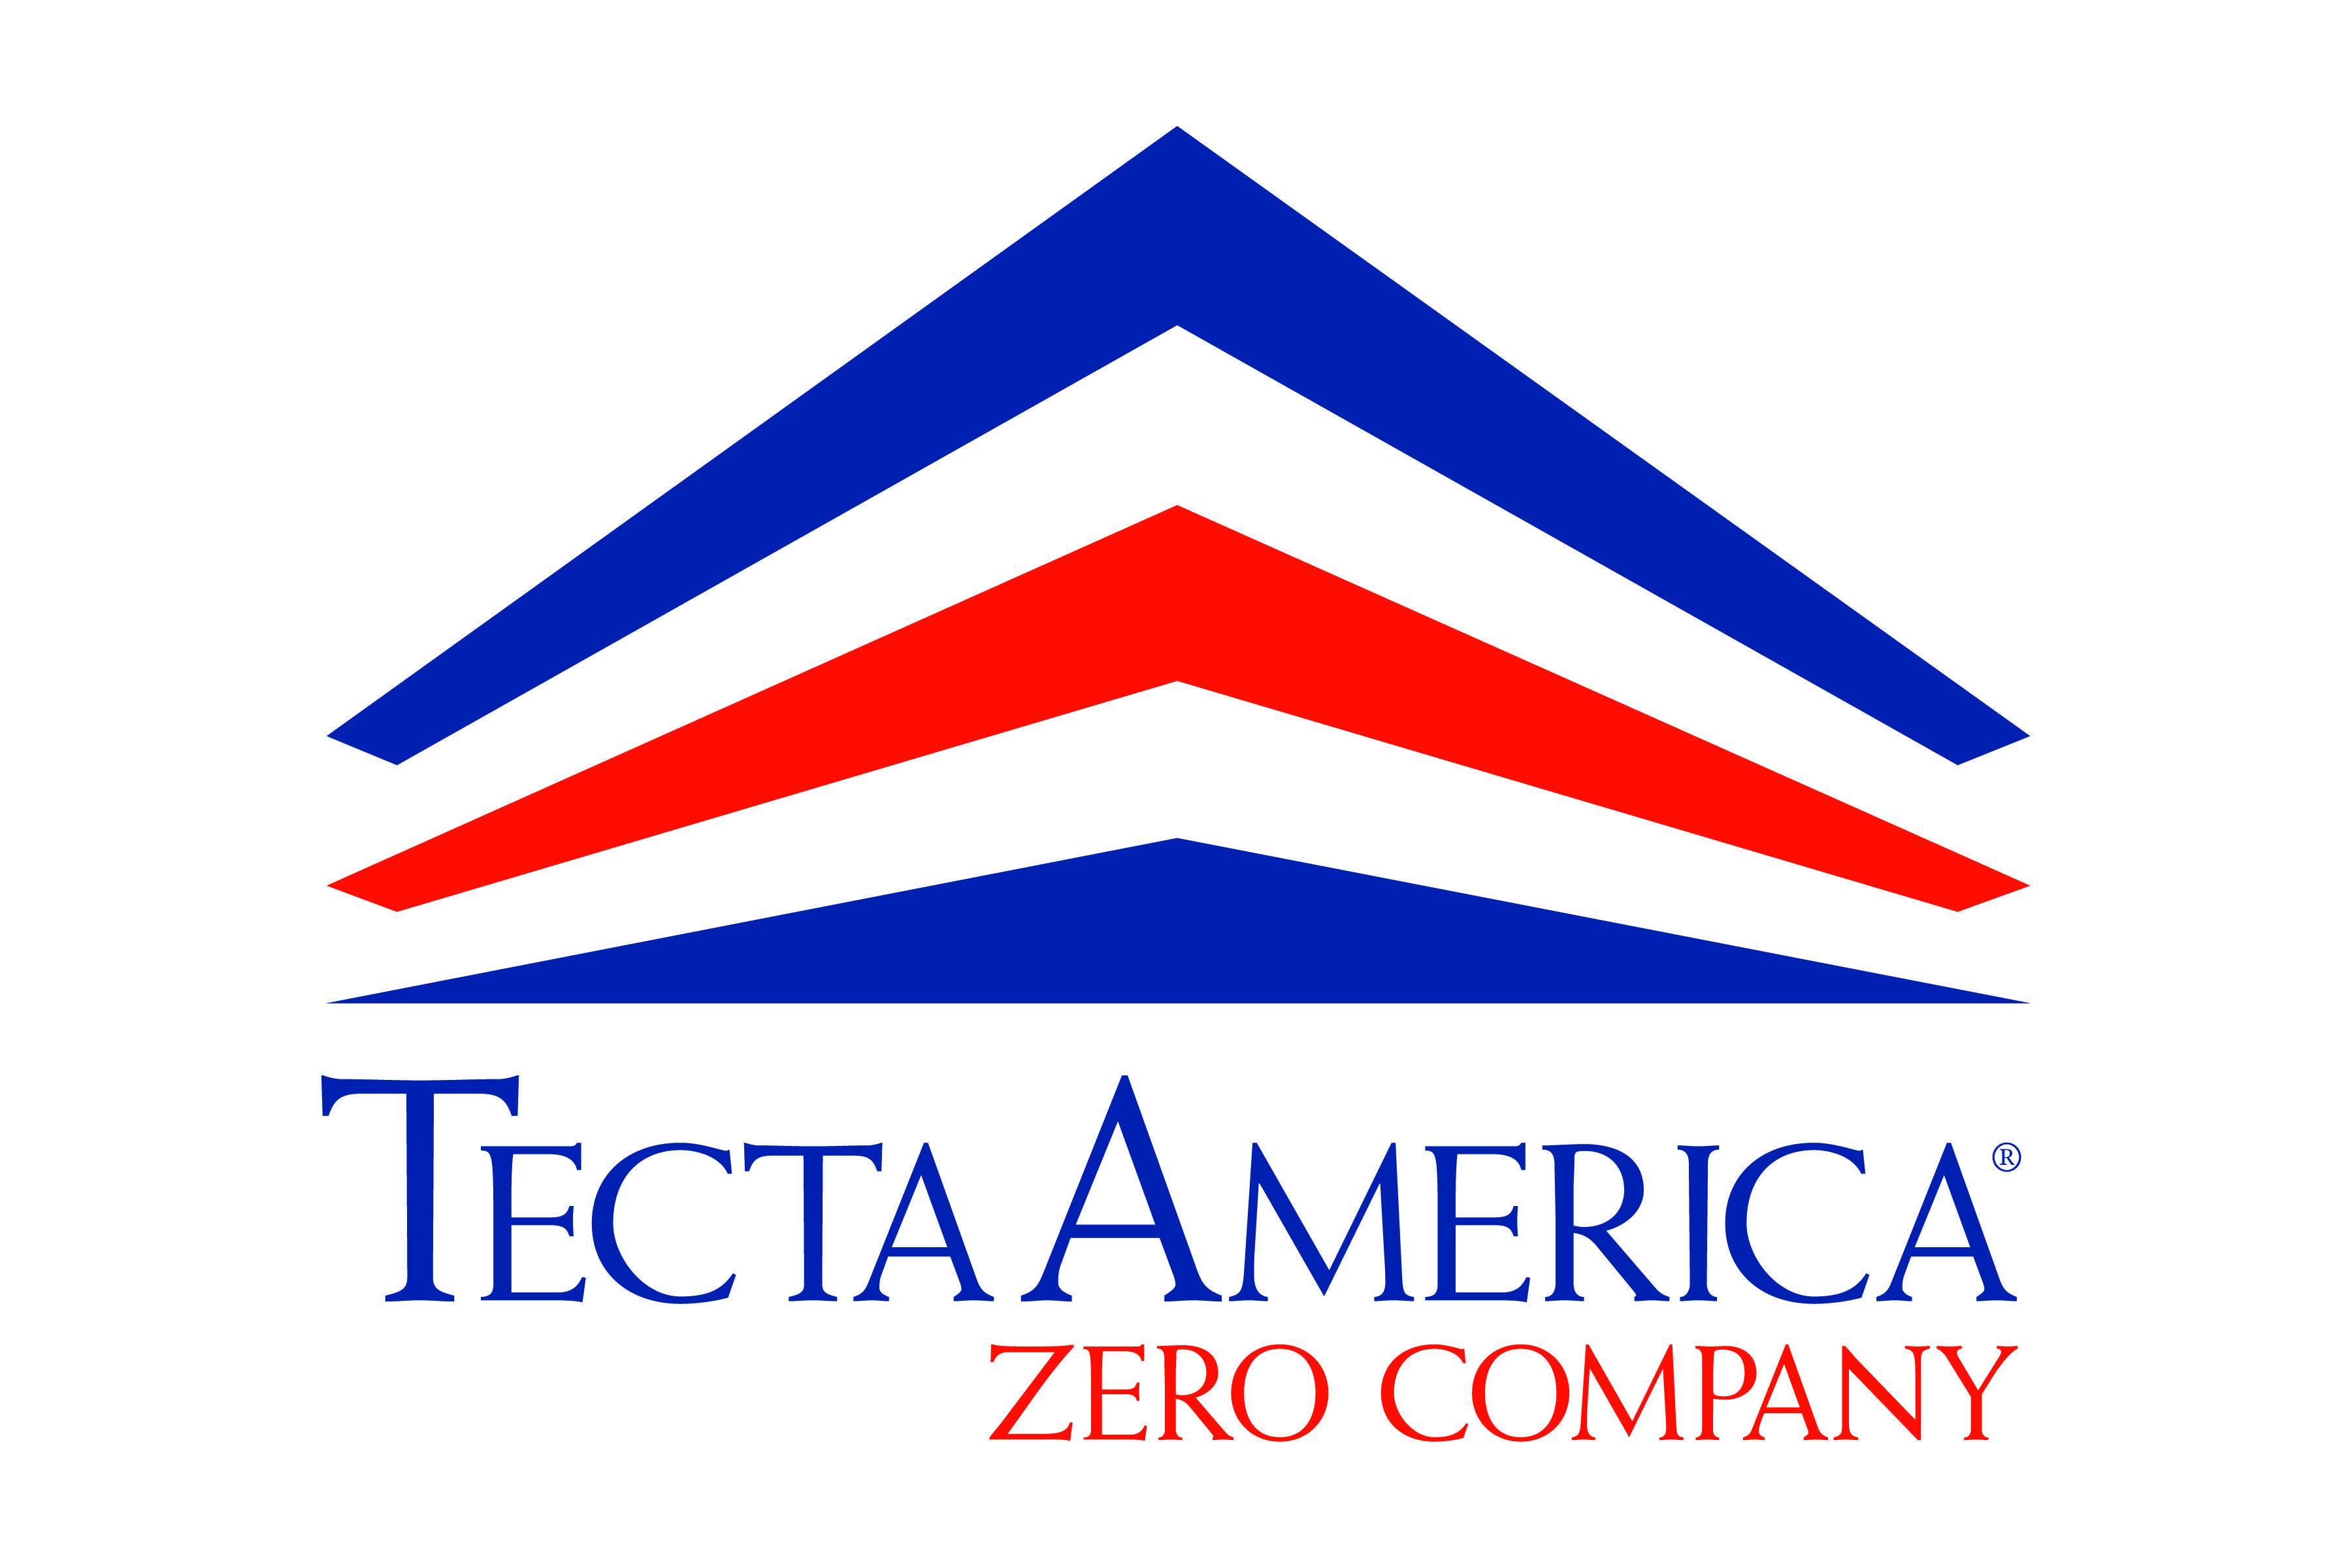 Tecta America company logo